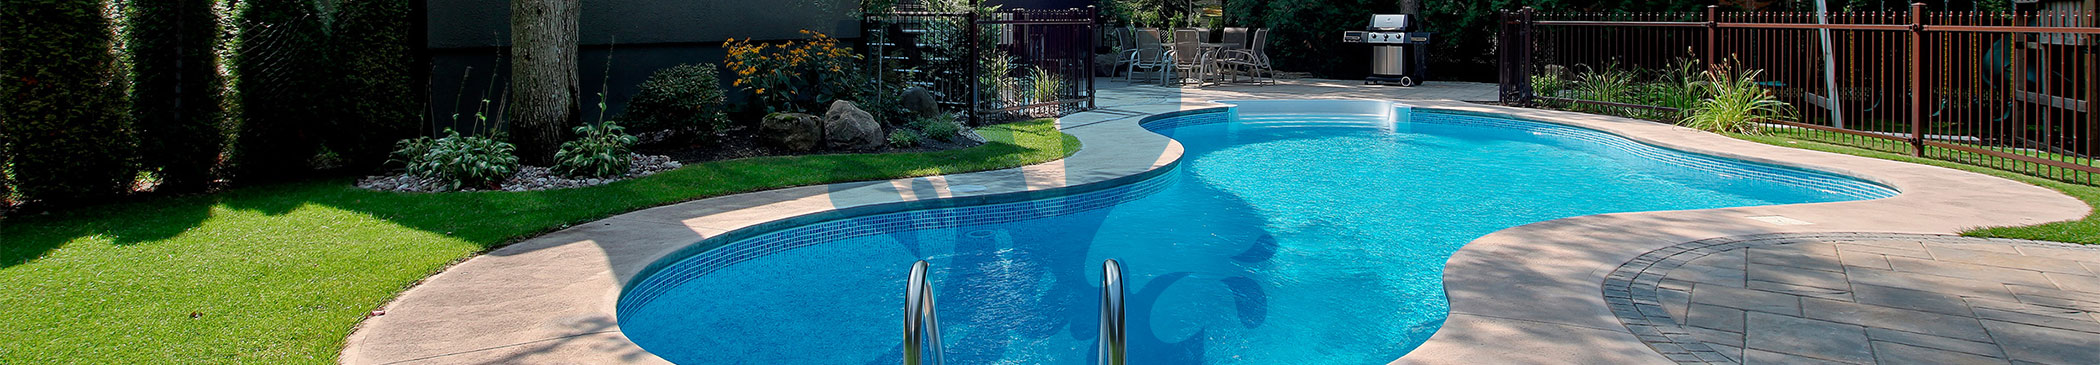 Piscine ren pitre accueil for Chauffe piscine au gaz propane